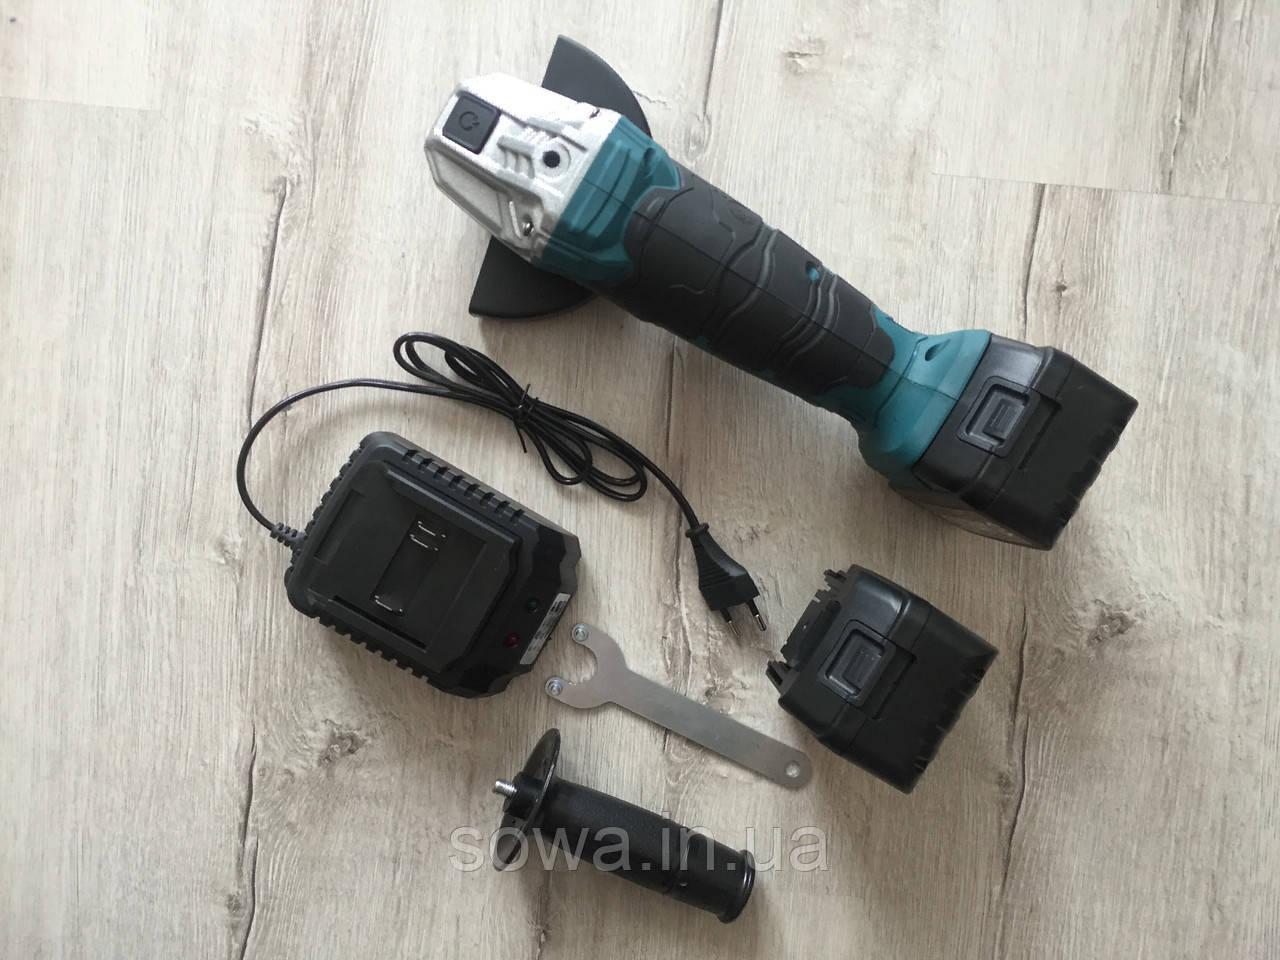 ✔️ Болгарка аккумуляторная Al-Fa ALCAG125 | 21V   + ПОДАРОК